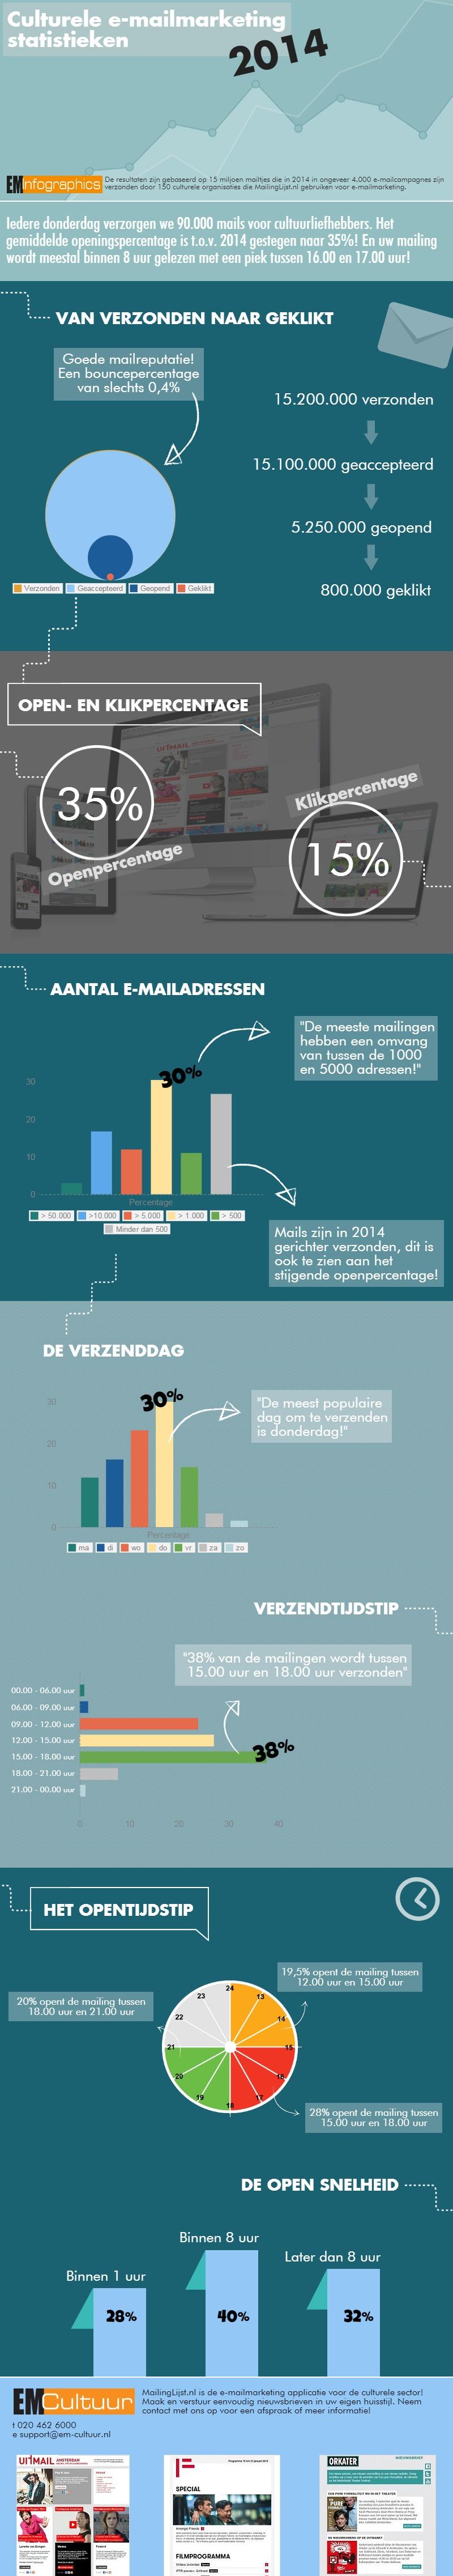 E-mailmarketing-2014